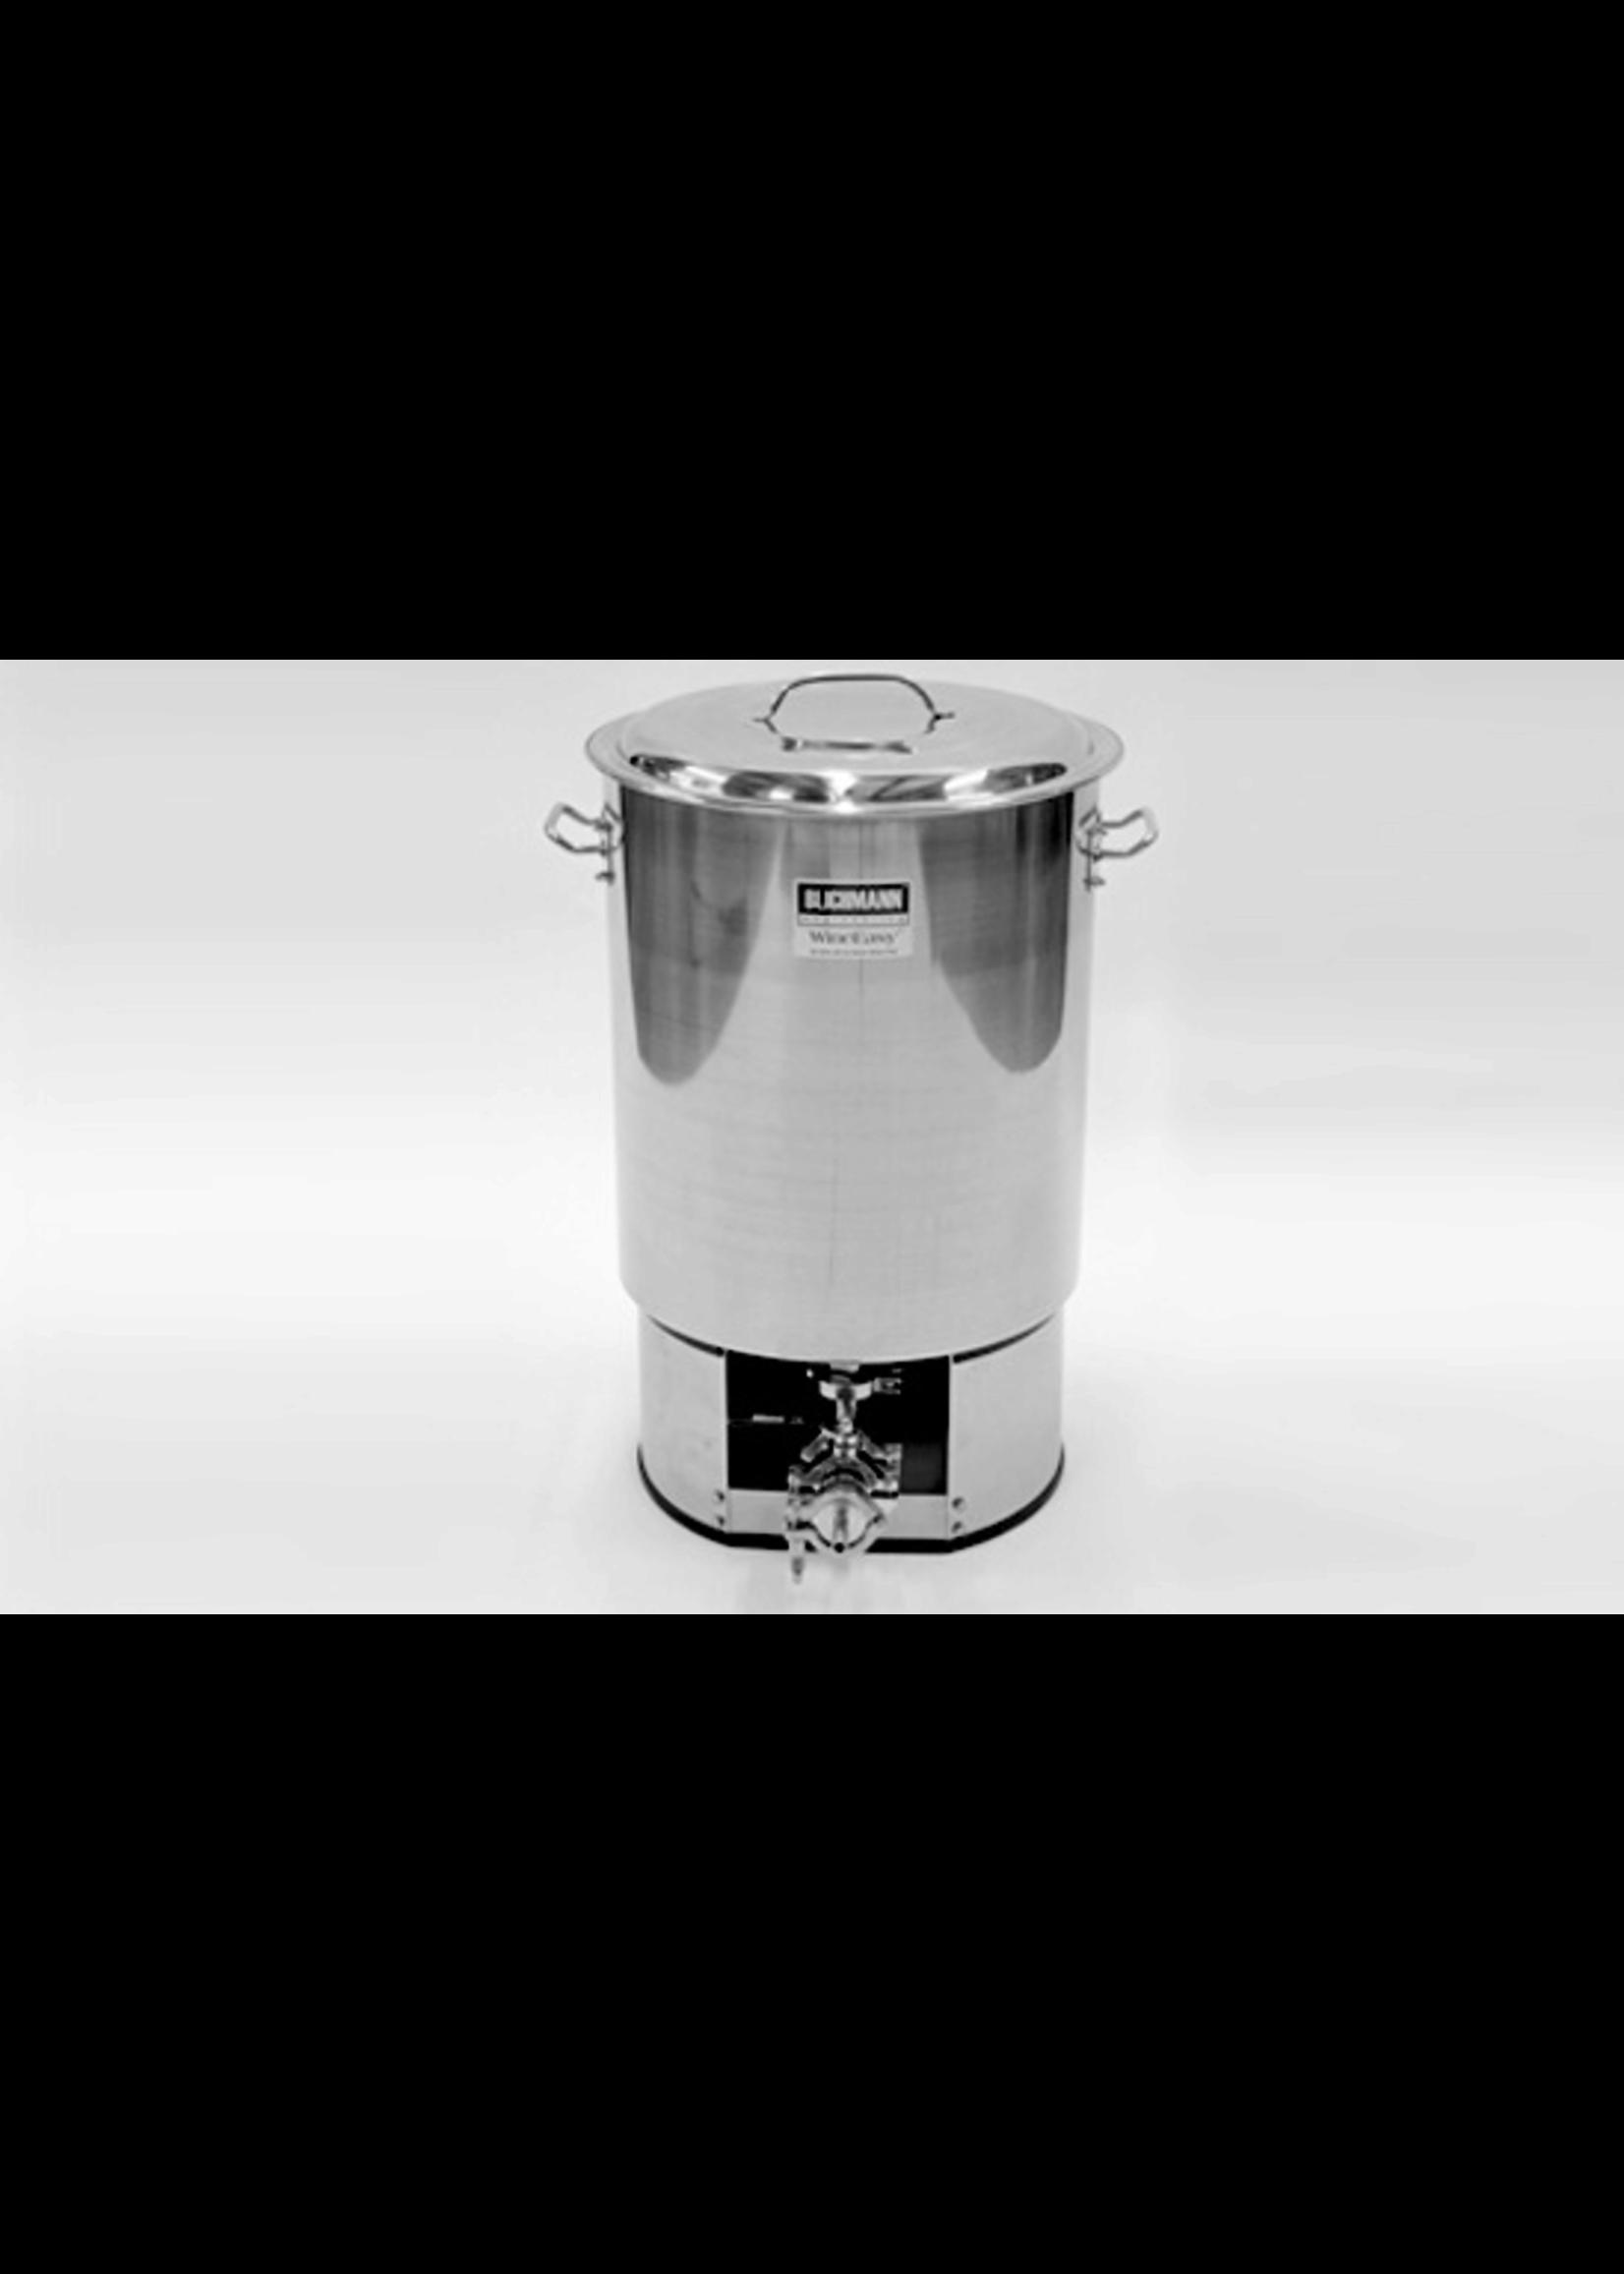 Blichmann Blichmann WineEasy - 30 Gallon Fermentor